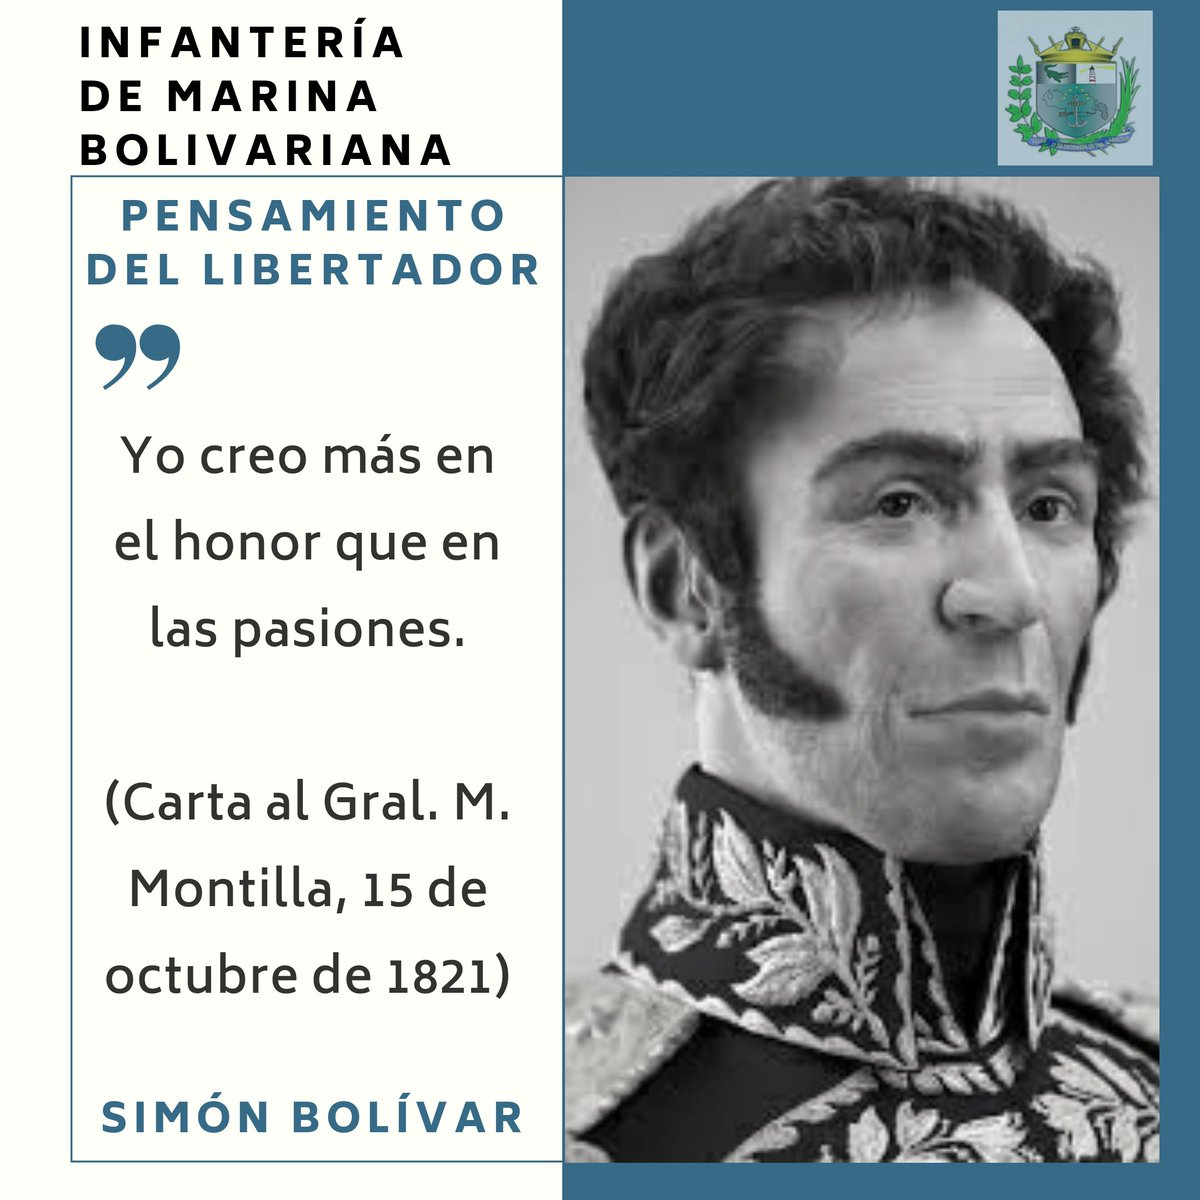 Bolivar, Padre Libertador. Bicentenario - Página 25 El6y6mZWkAA6FkS?format=jpg&name=medium